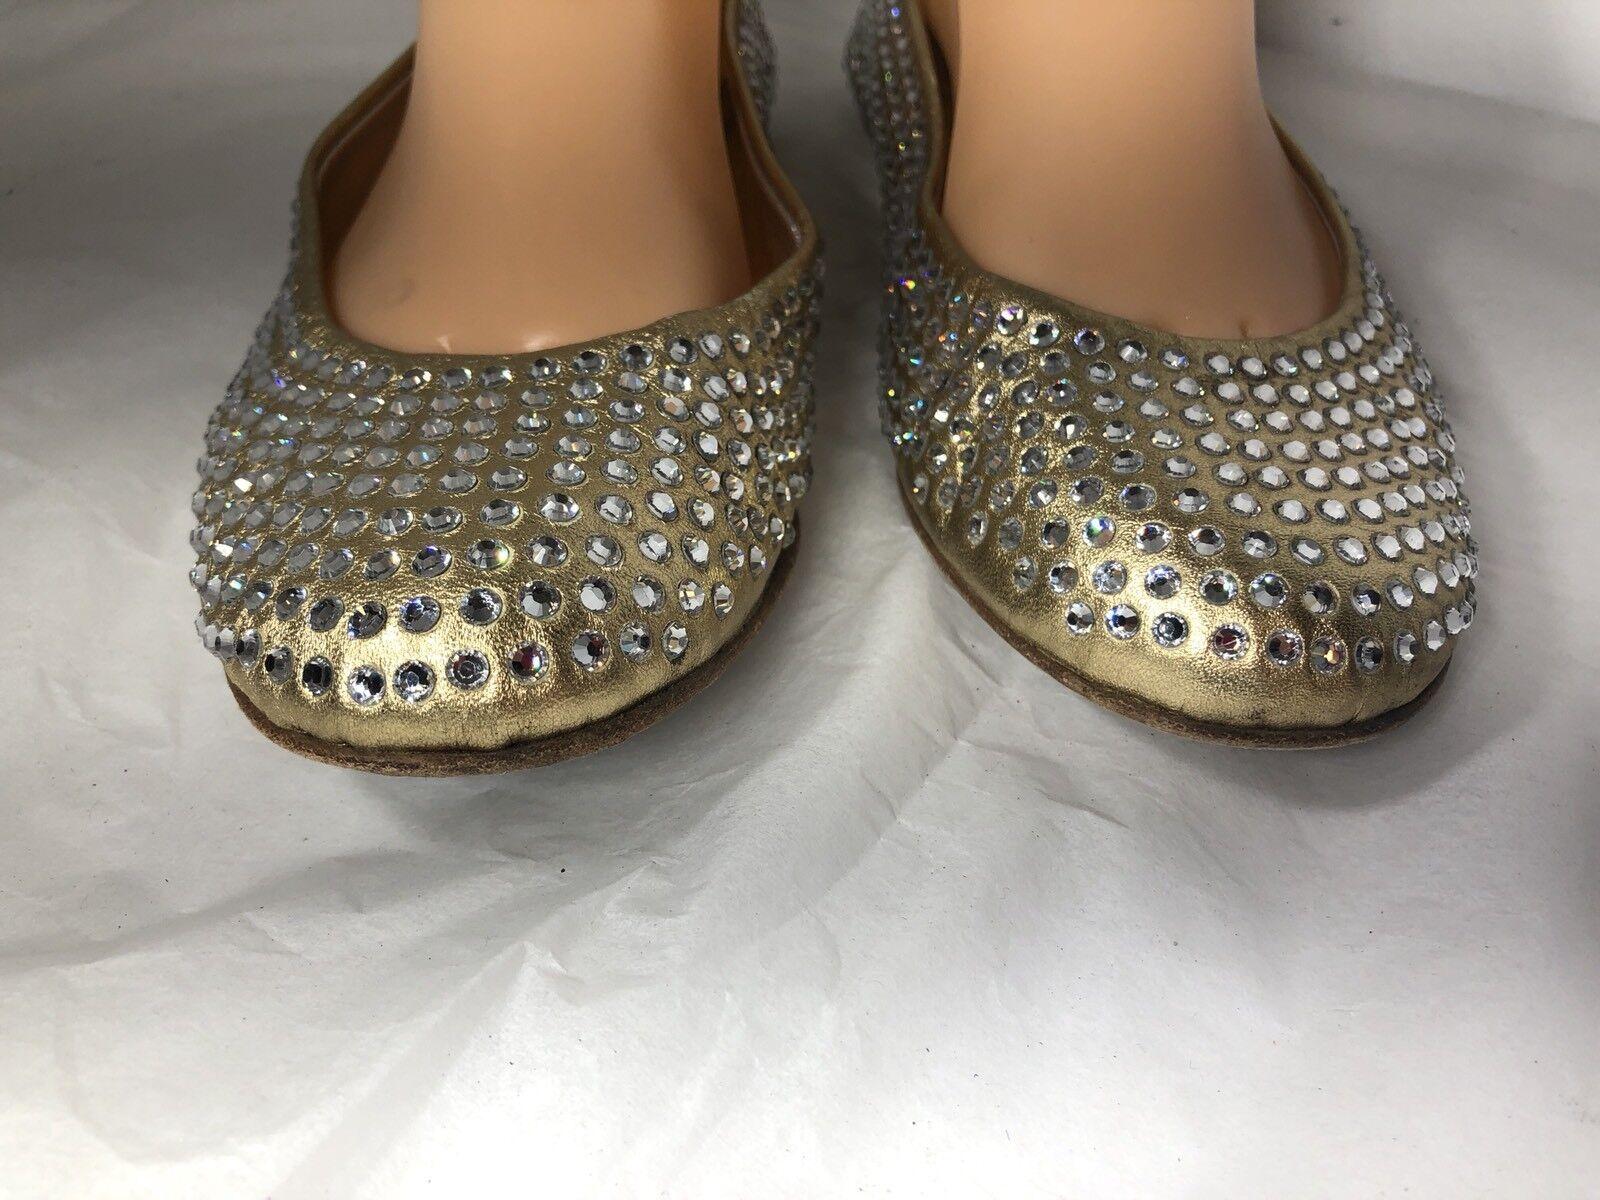 Giuseppe Zanotti Embellished Crystal Flats Studs Gold Ballet Shoes Flats Crystal SZ 37 93058a